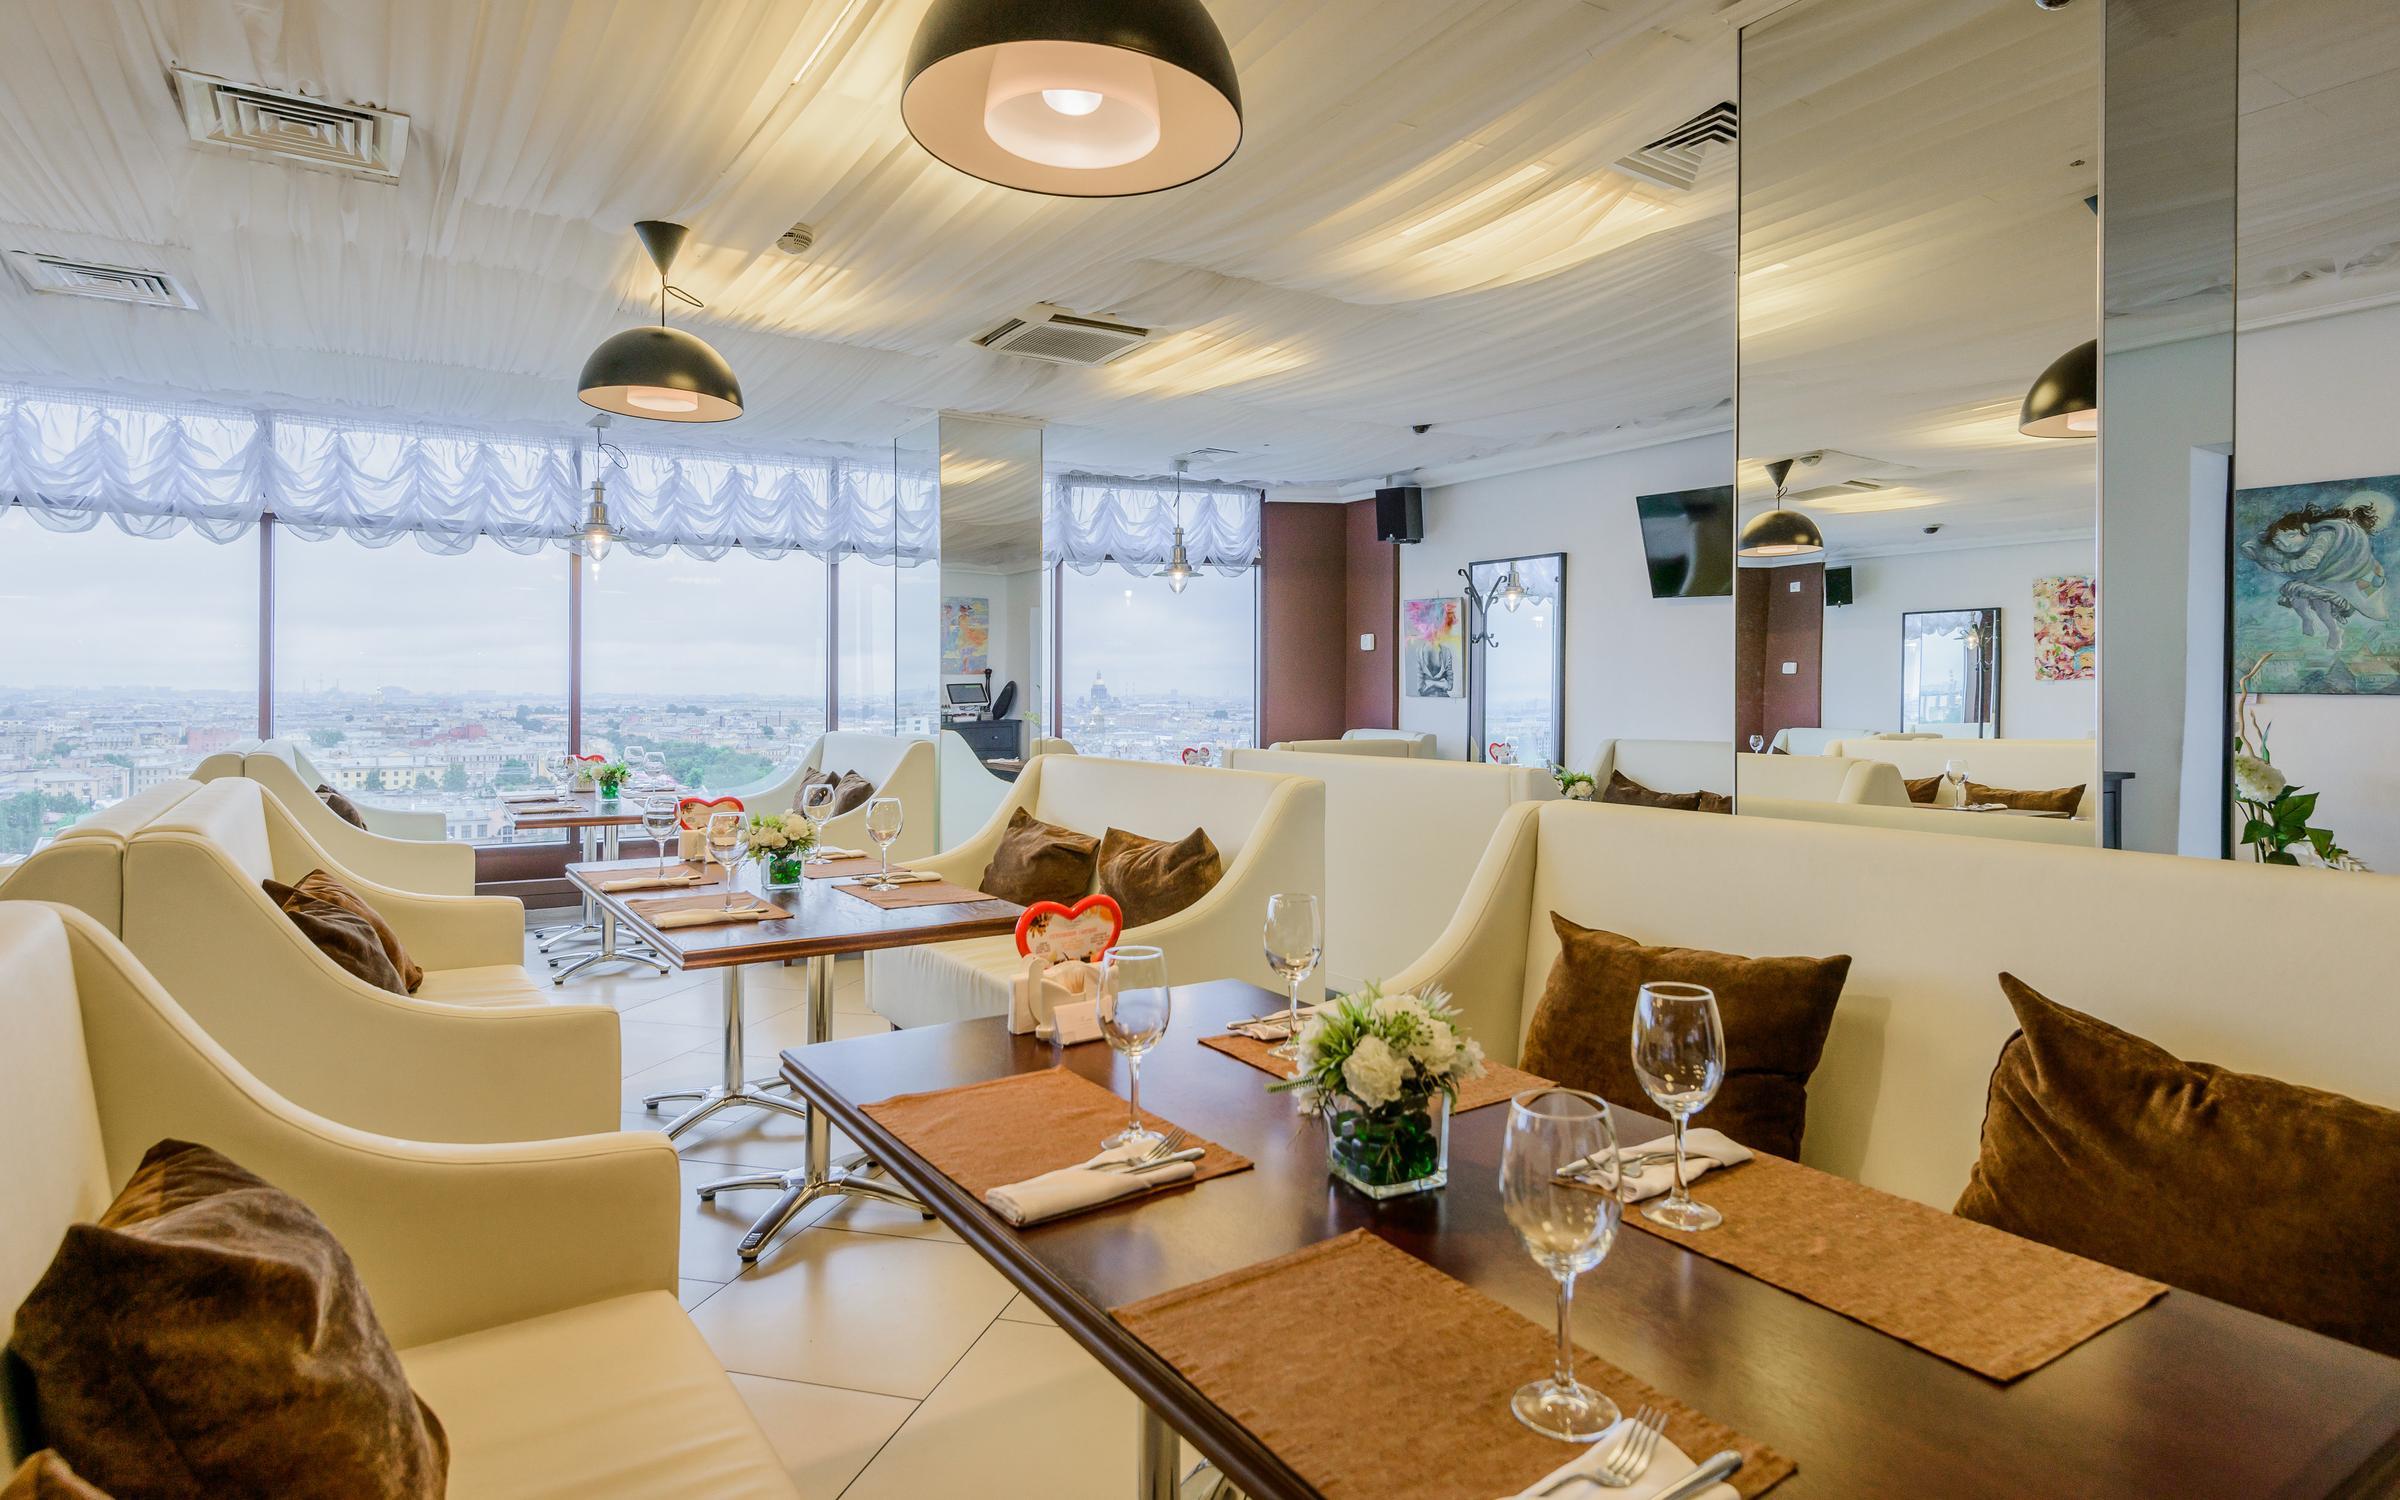 фотография Ресторана Я люблю... La panorama